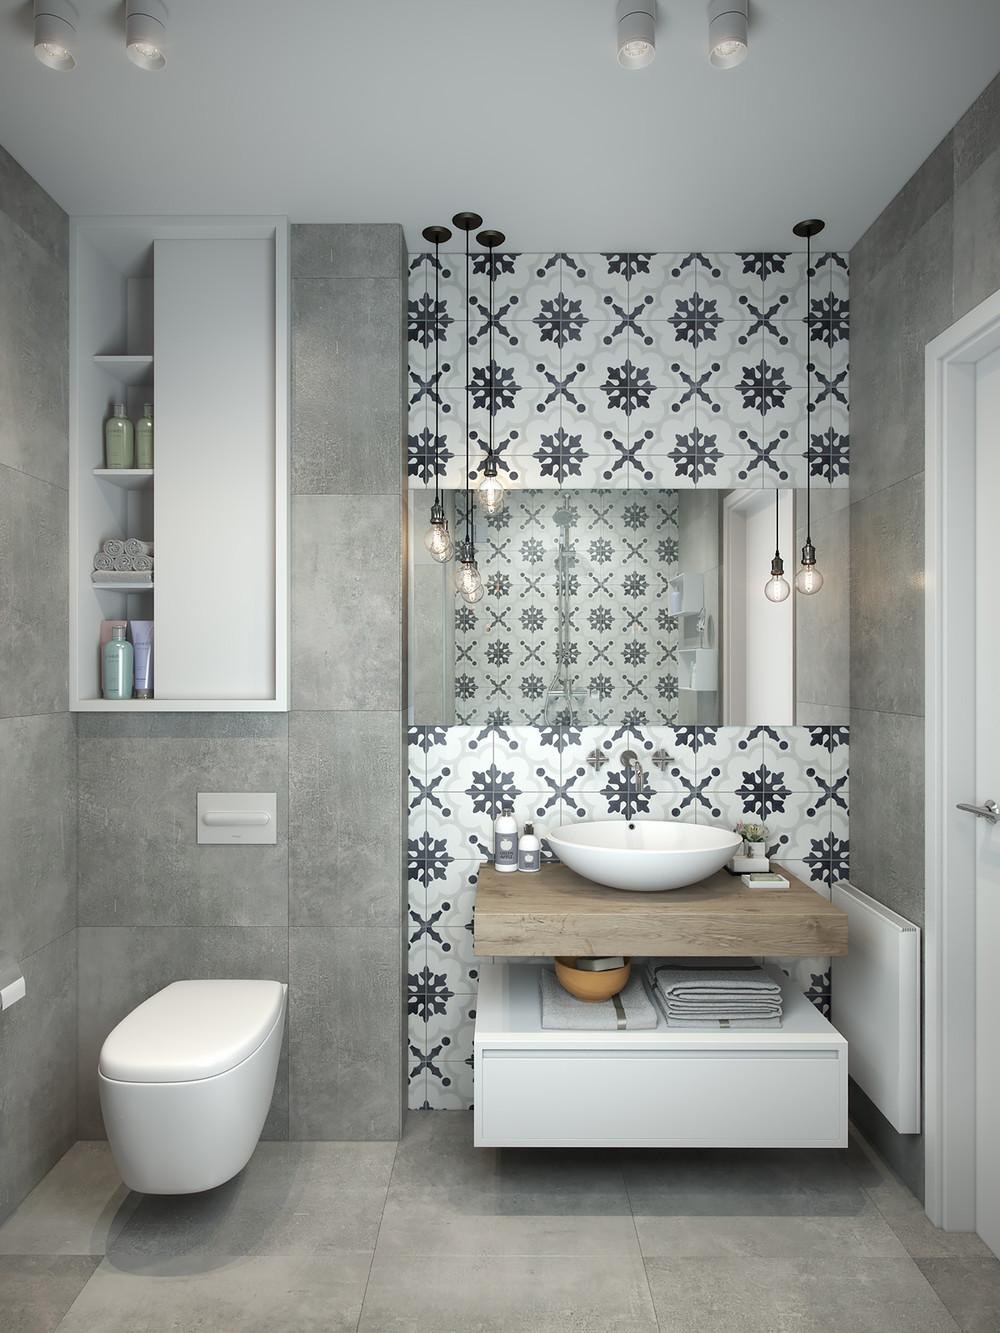 black and white wallpaper theme